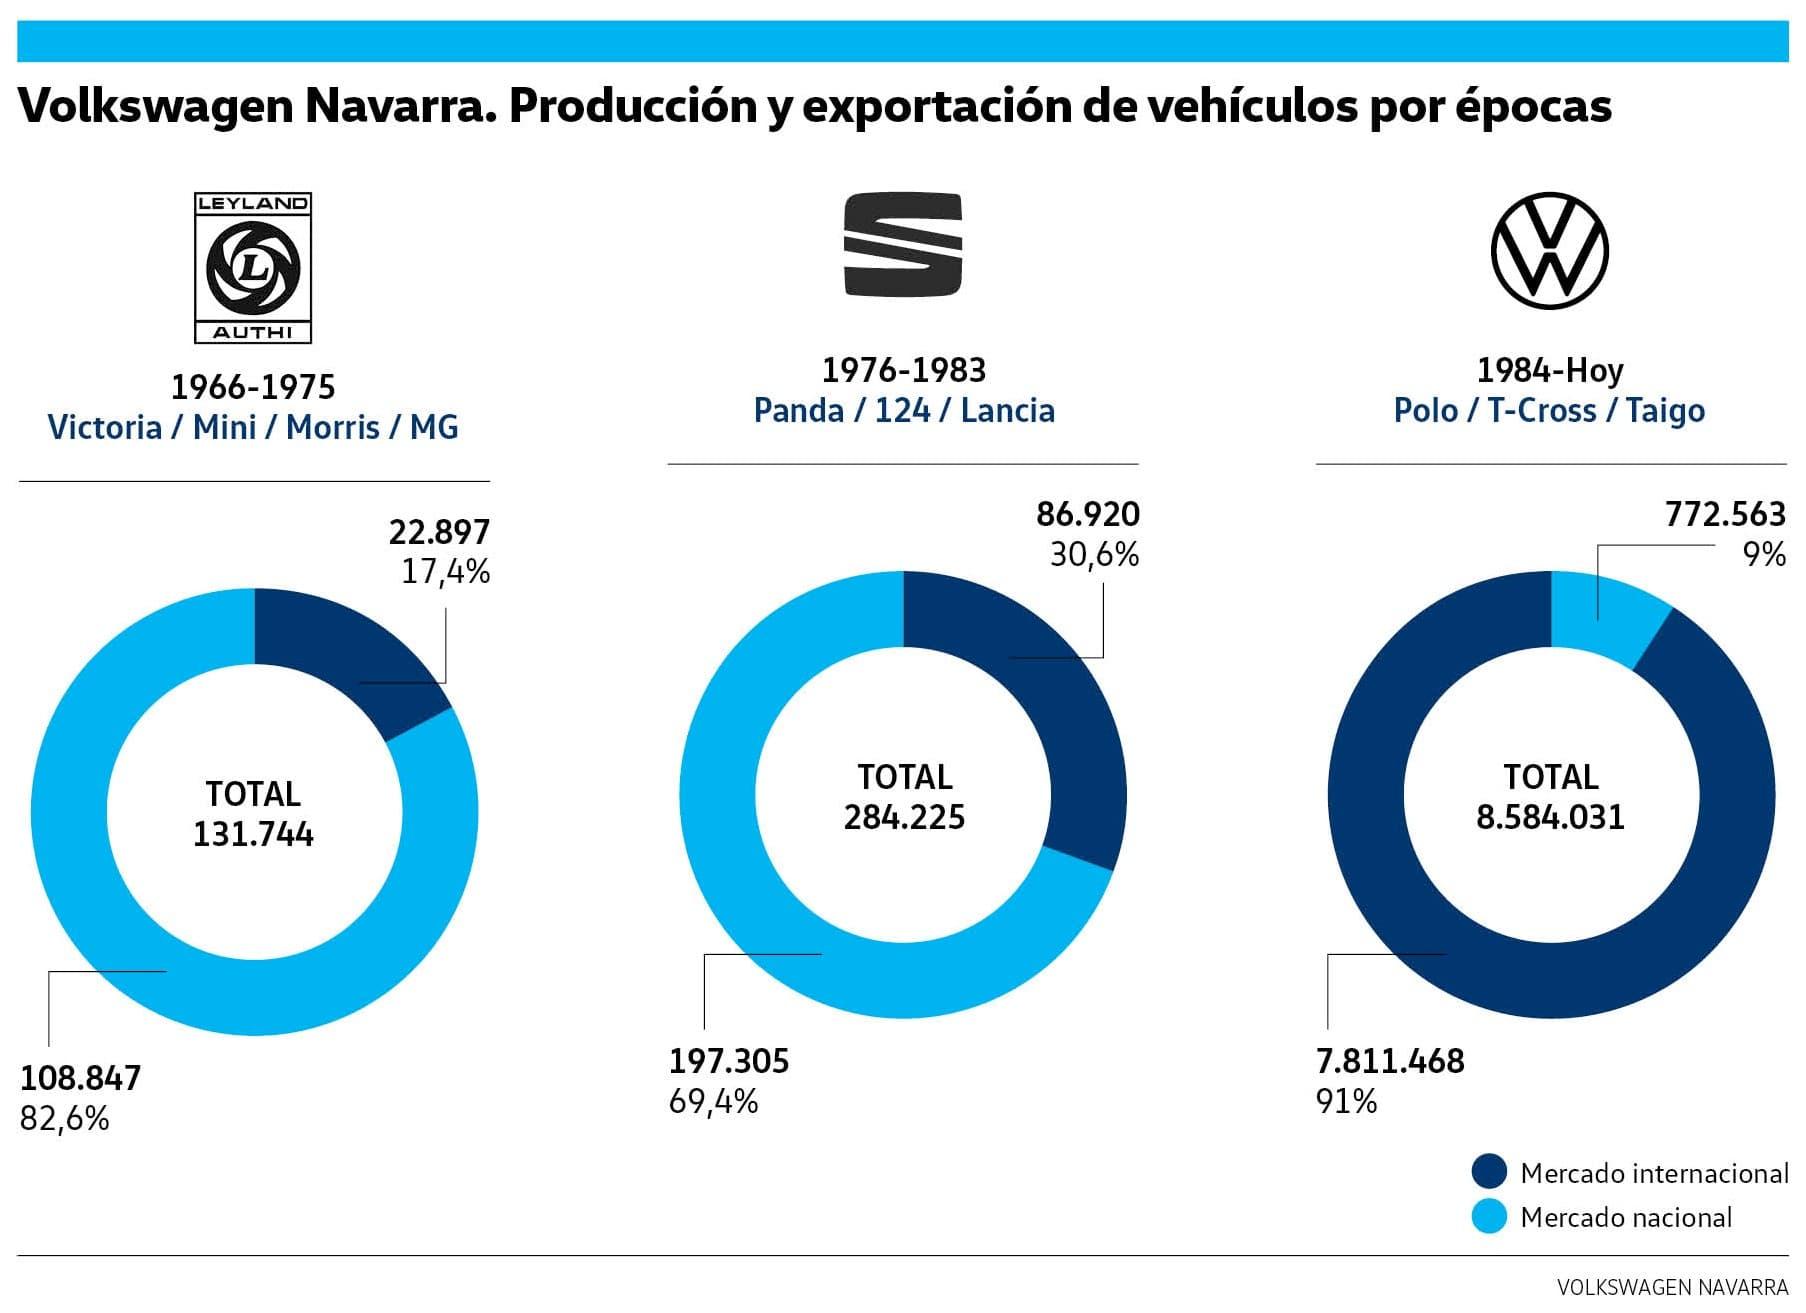 Volkswagen Navarra fabrica su coche 9 millones 1